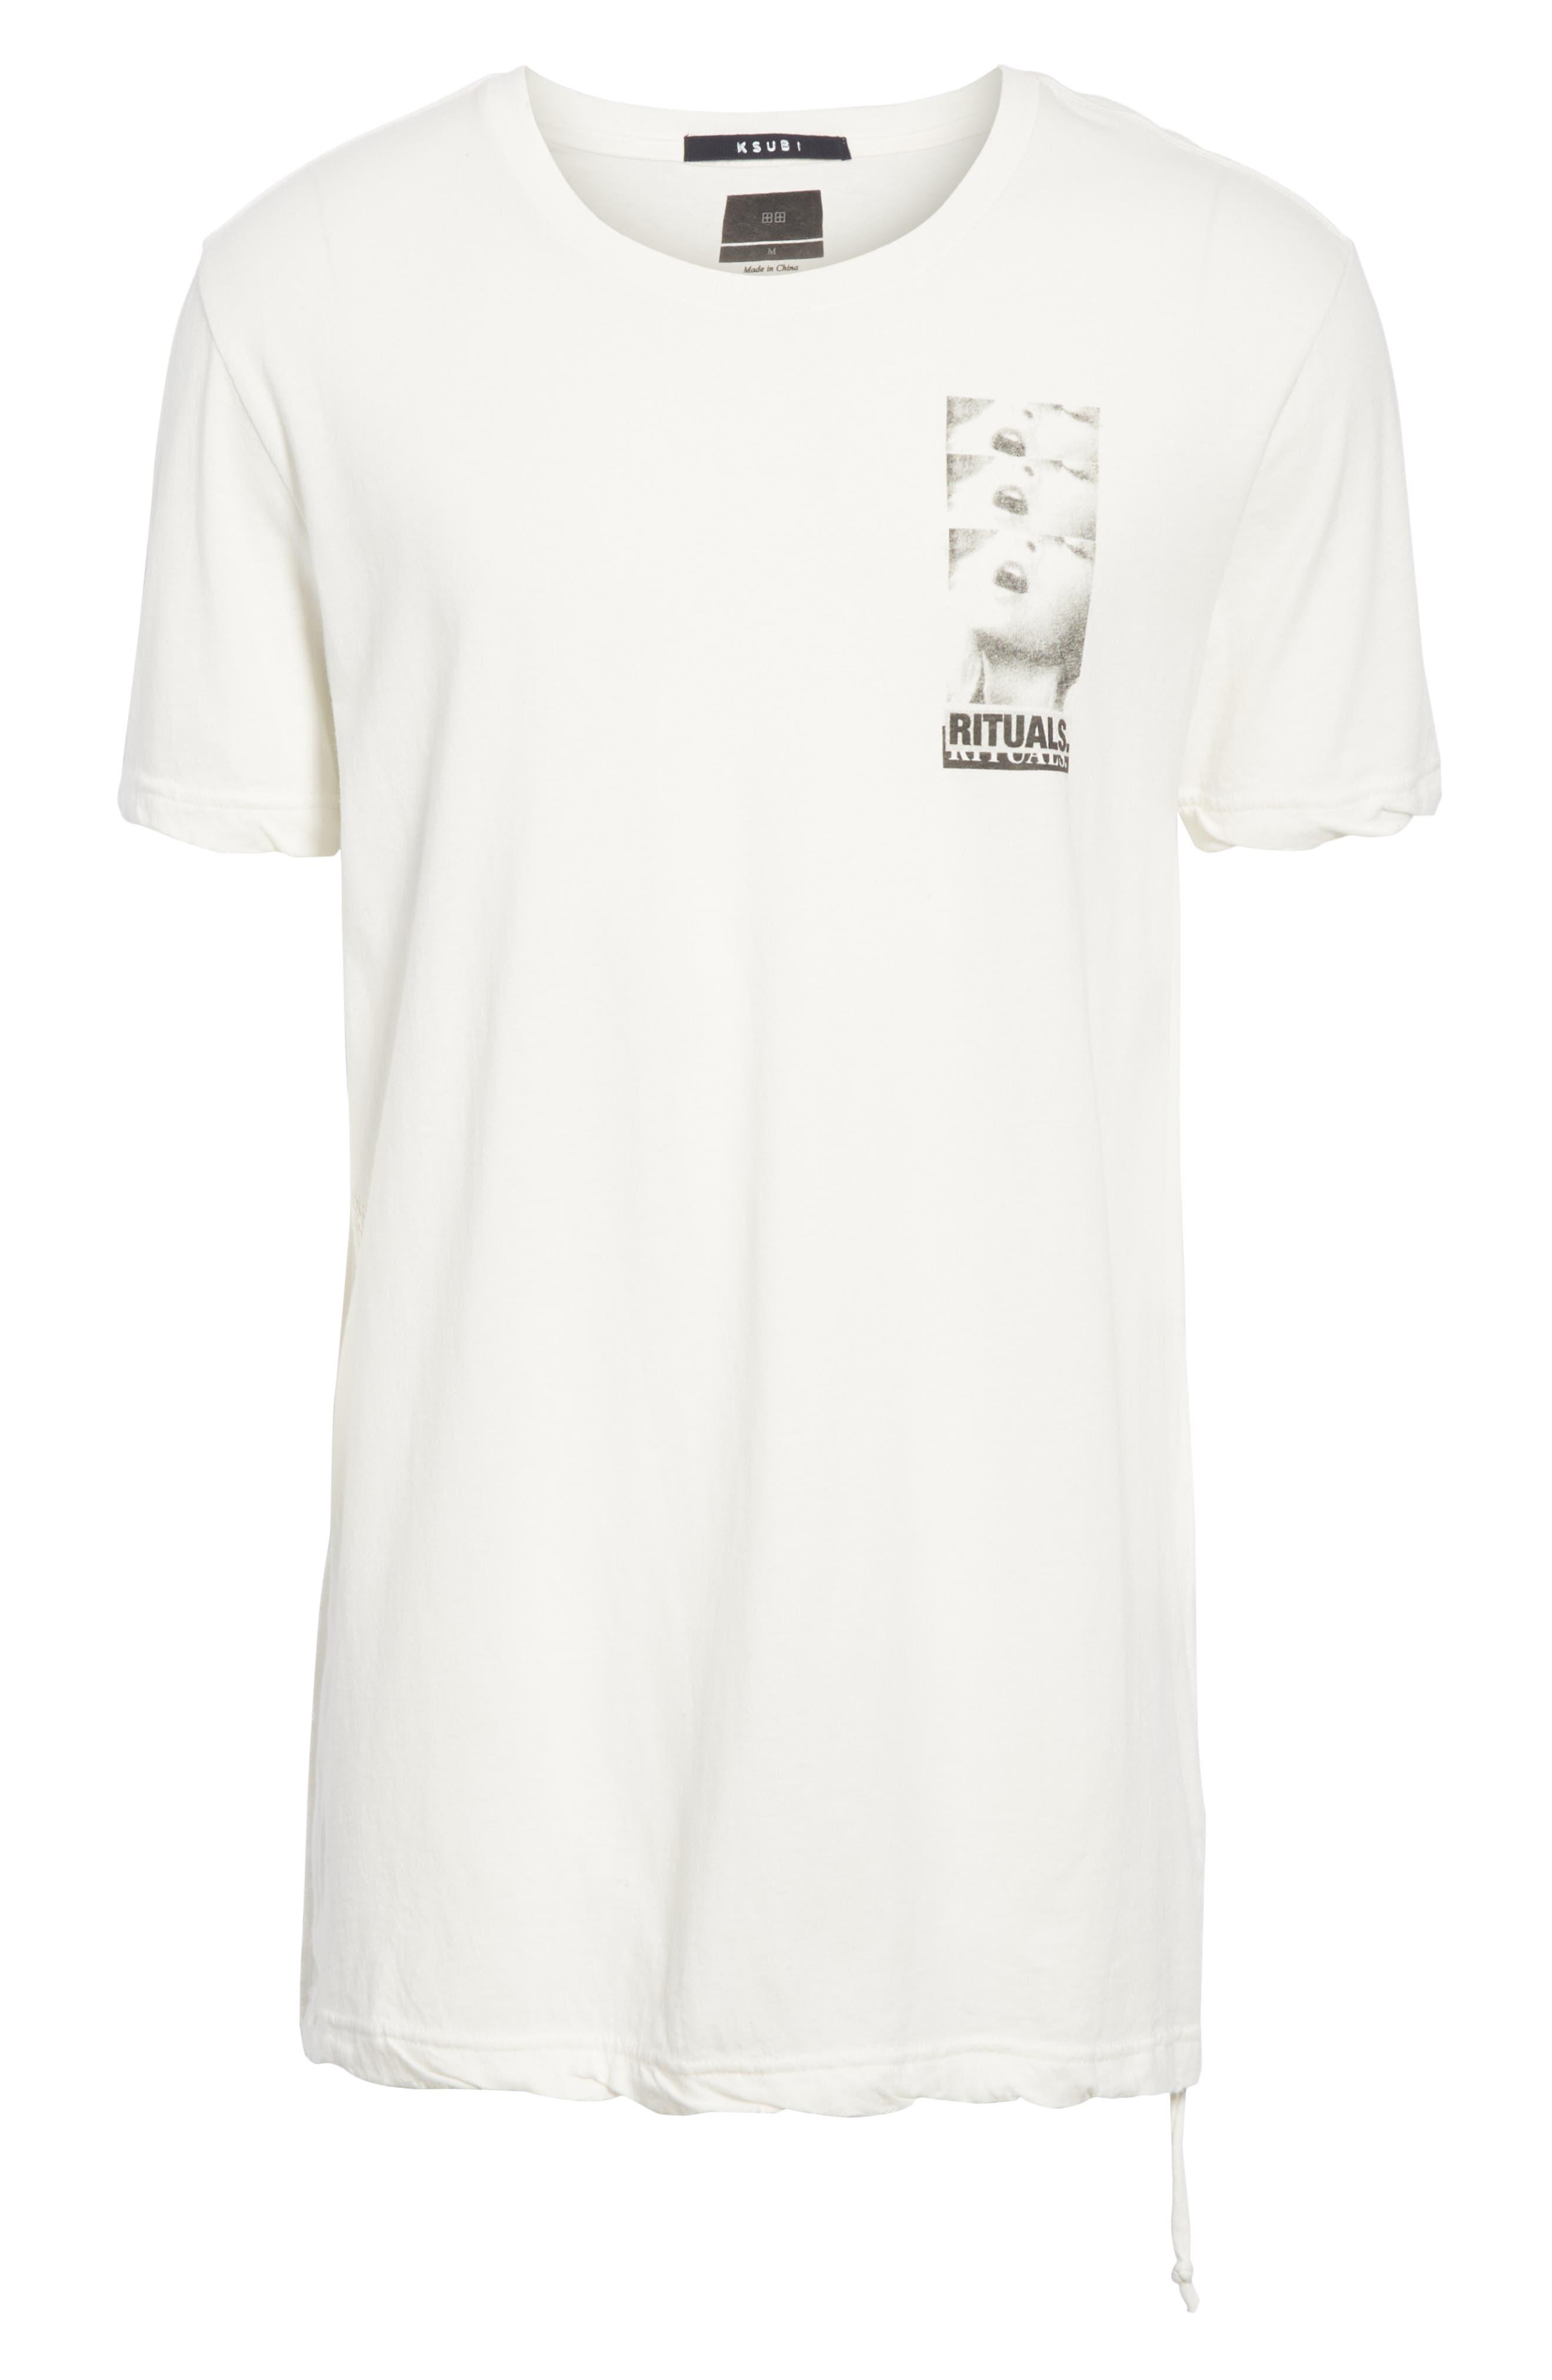 Rituals Graphic T-Shirt,                             Alternate thumbnail 6, color,                             WHITE